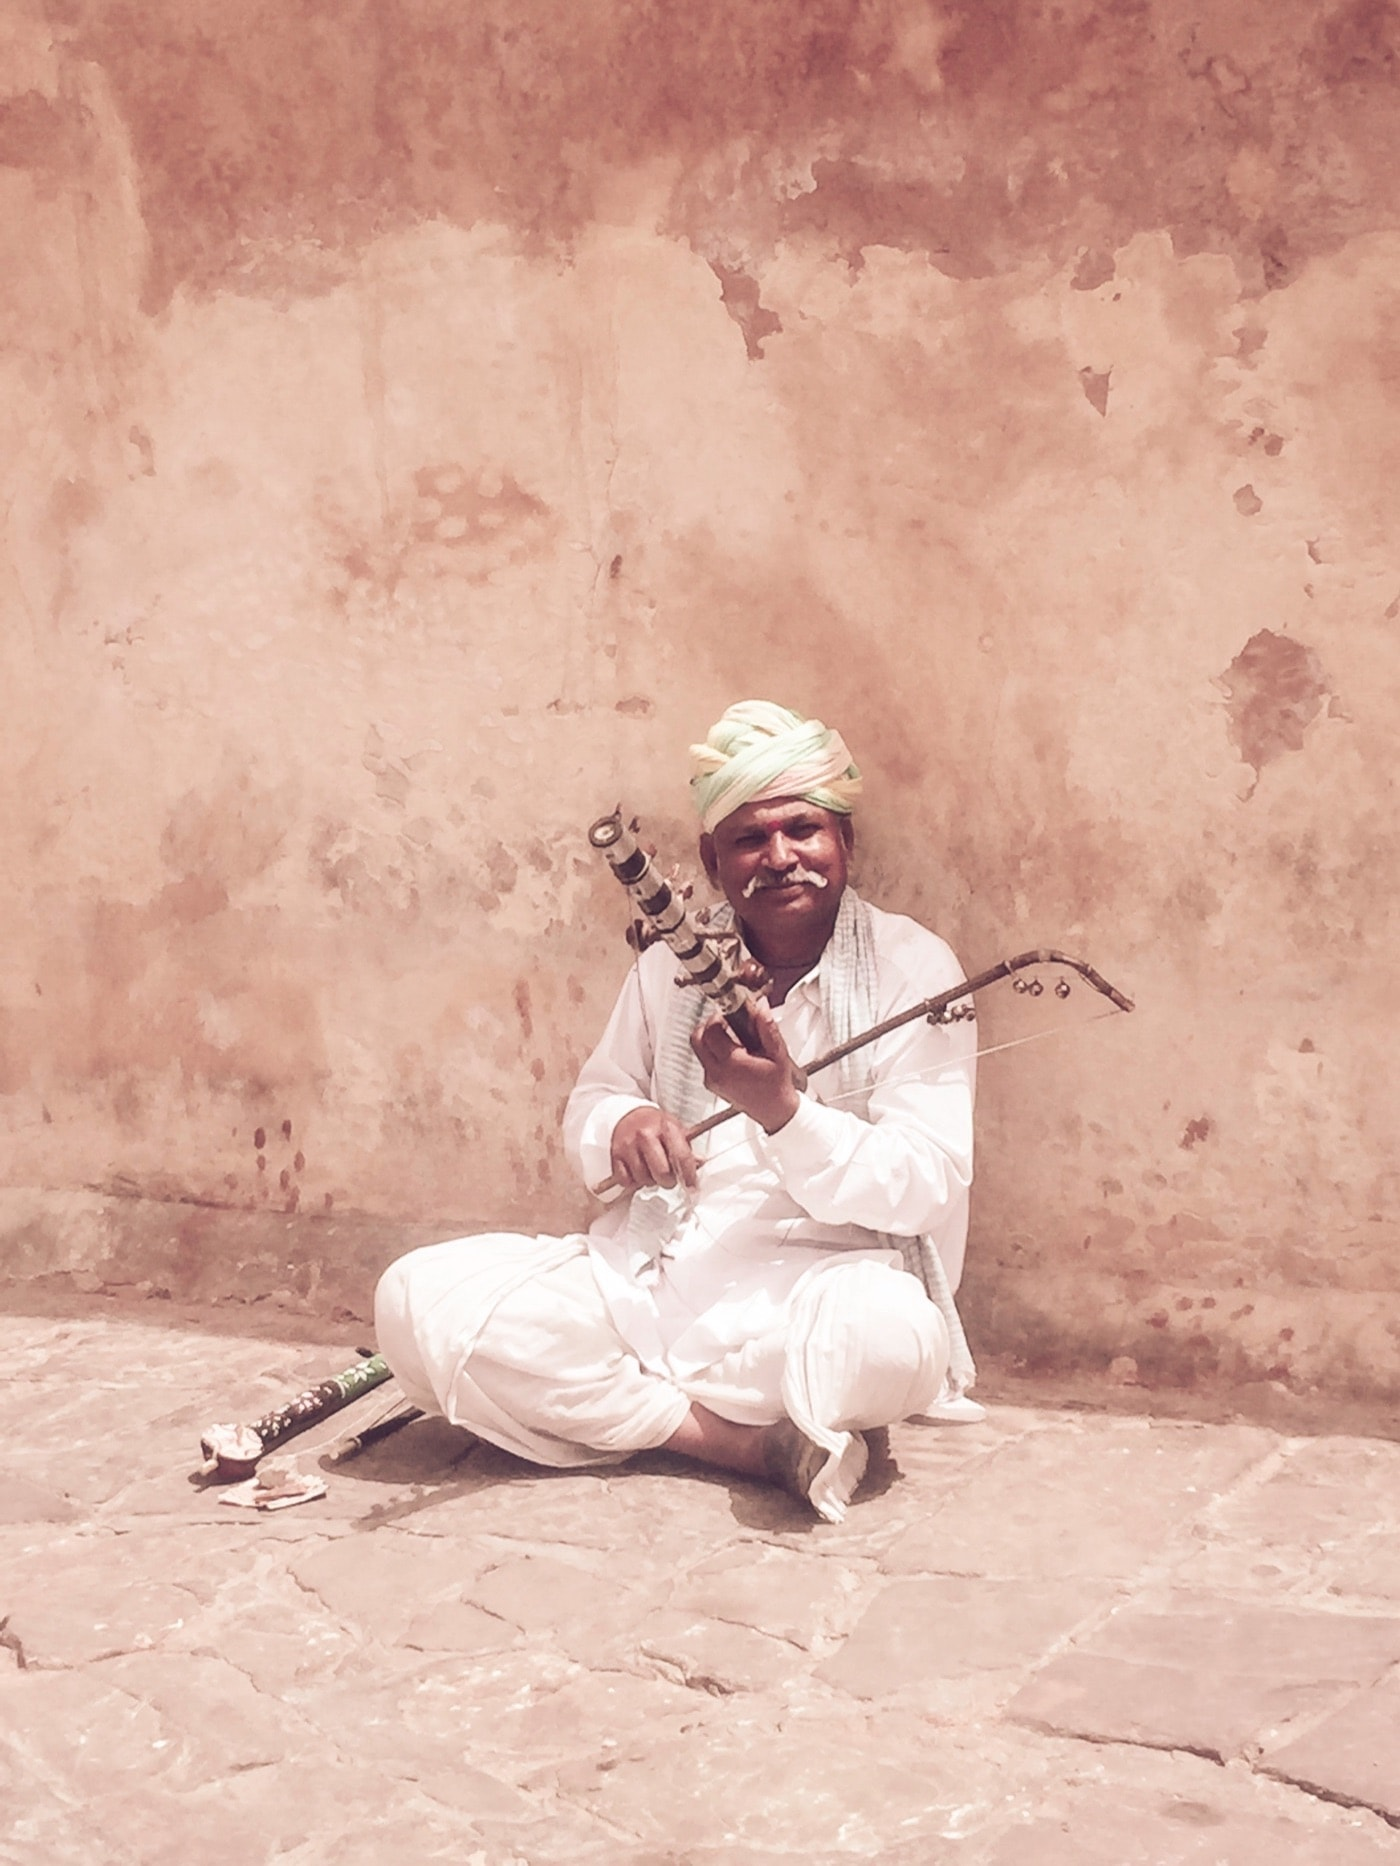 Rajathani Folk Musician Playing the Ektara outside Amber Fort